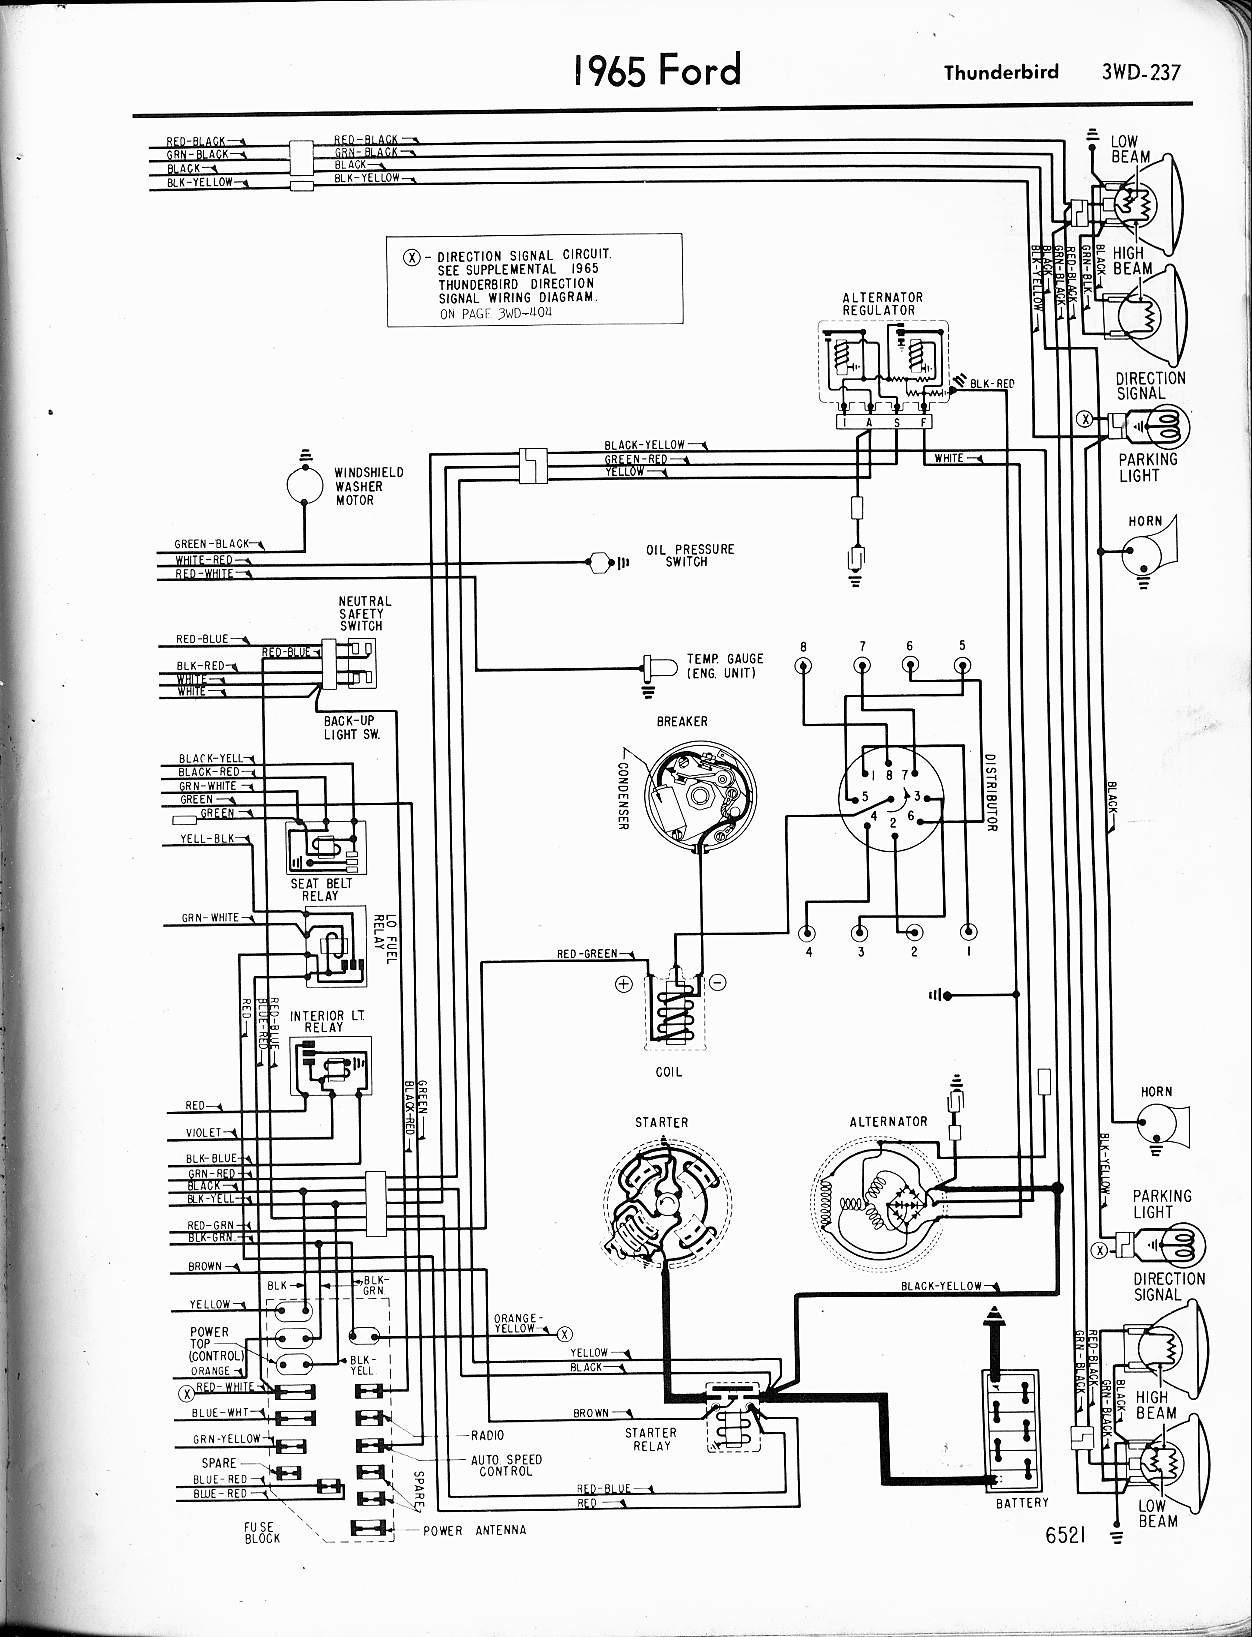 wrg 8282] peavey t 60 wiring diagram1965 ford thunderbird wiring diagram as well as 1965 ford rh dasdes co